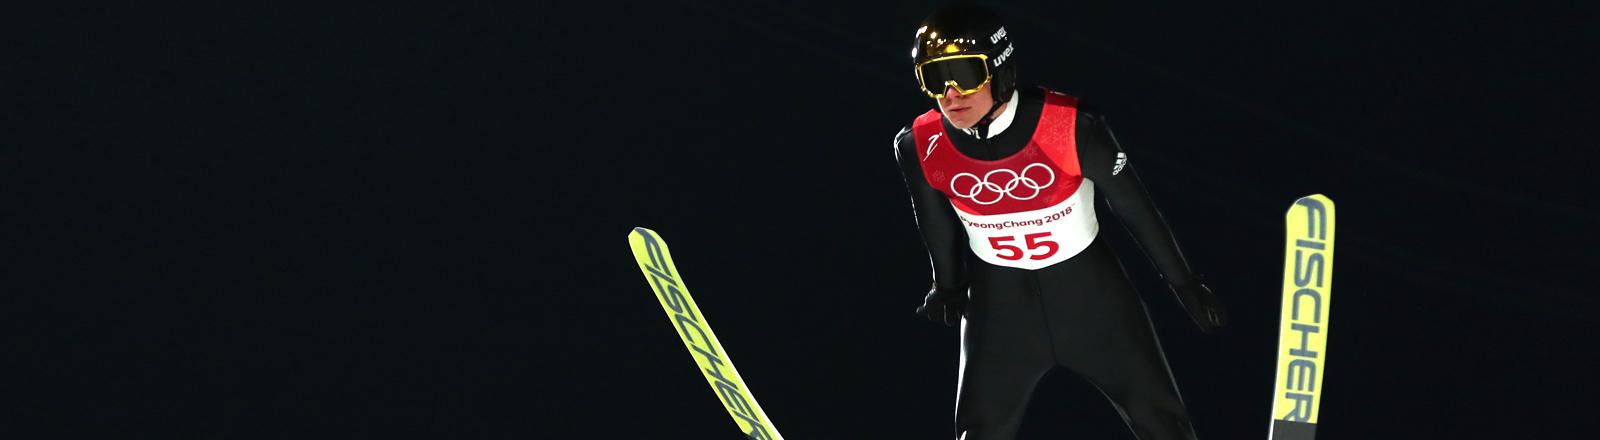 Andreas Wellinger beim Trainings-Springen in Südkorea